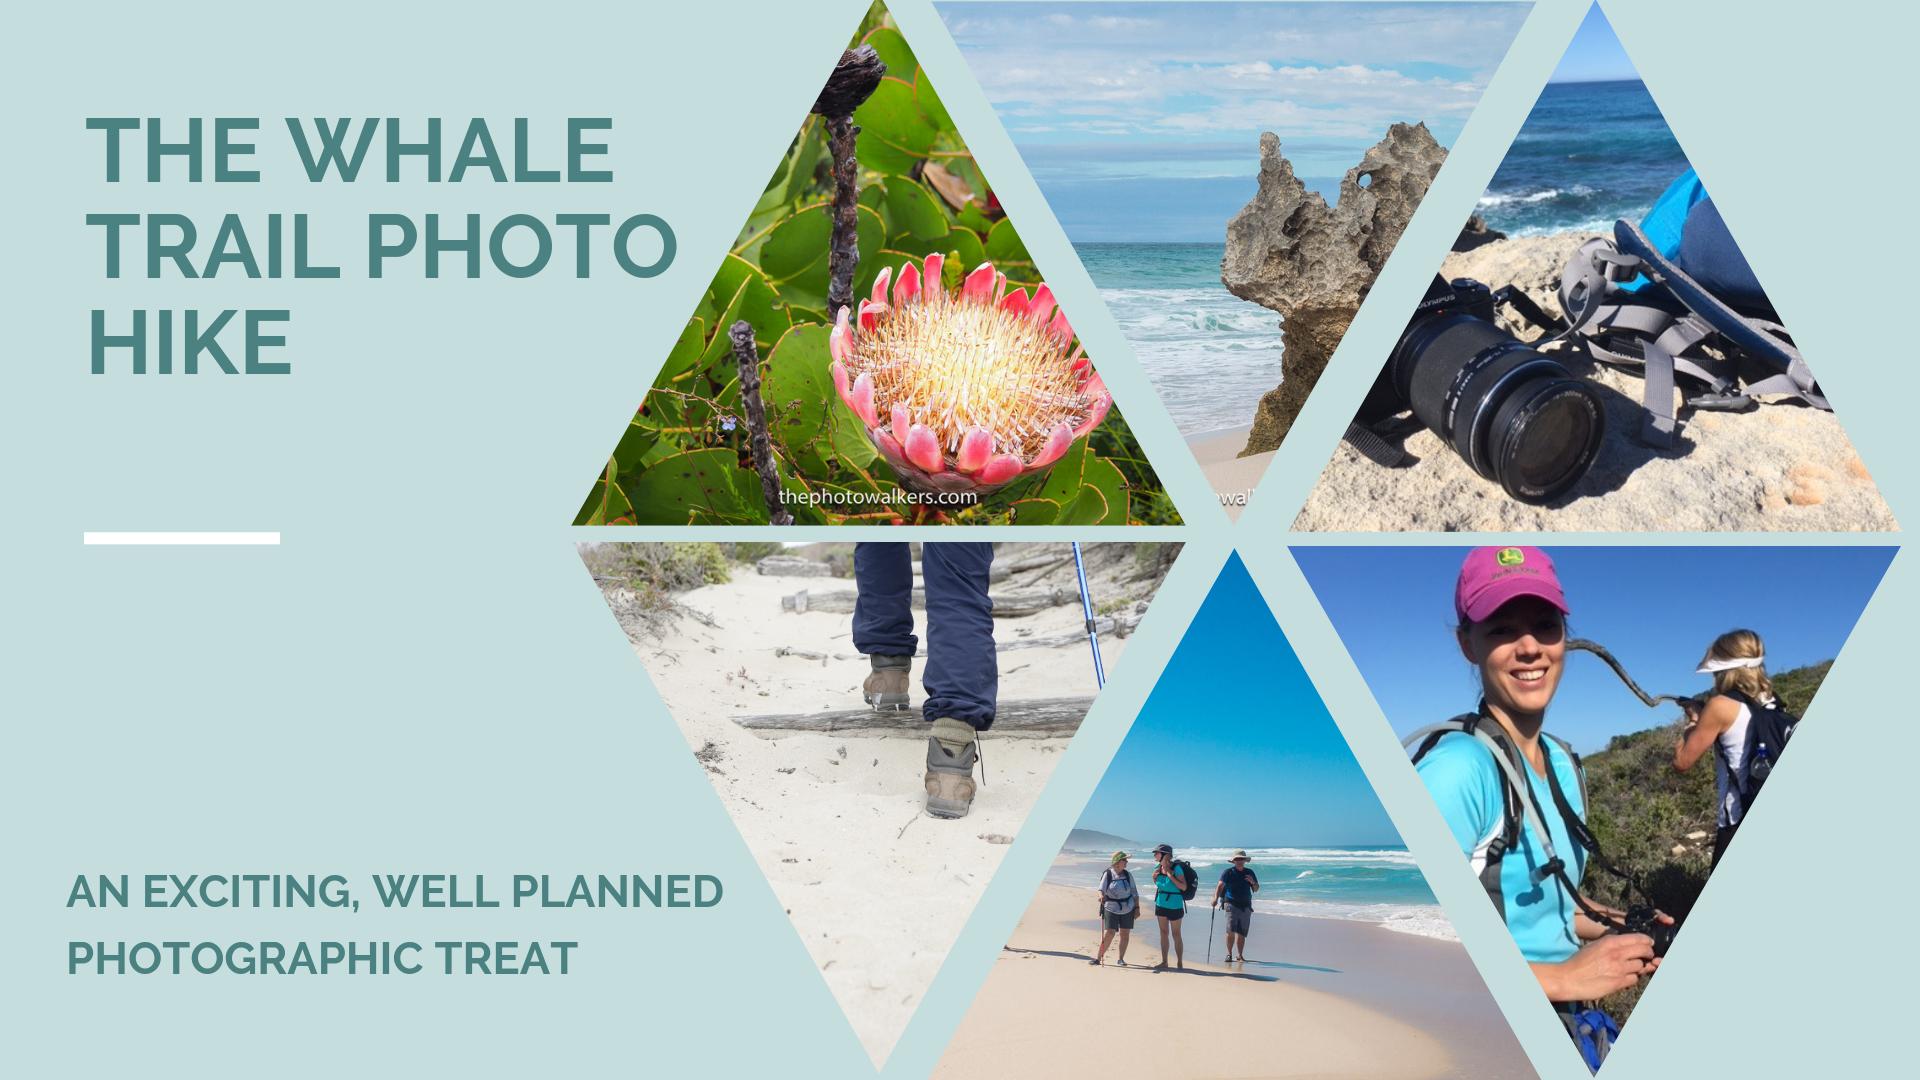 The Whale Trail Photo Hike